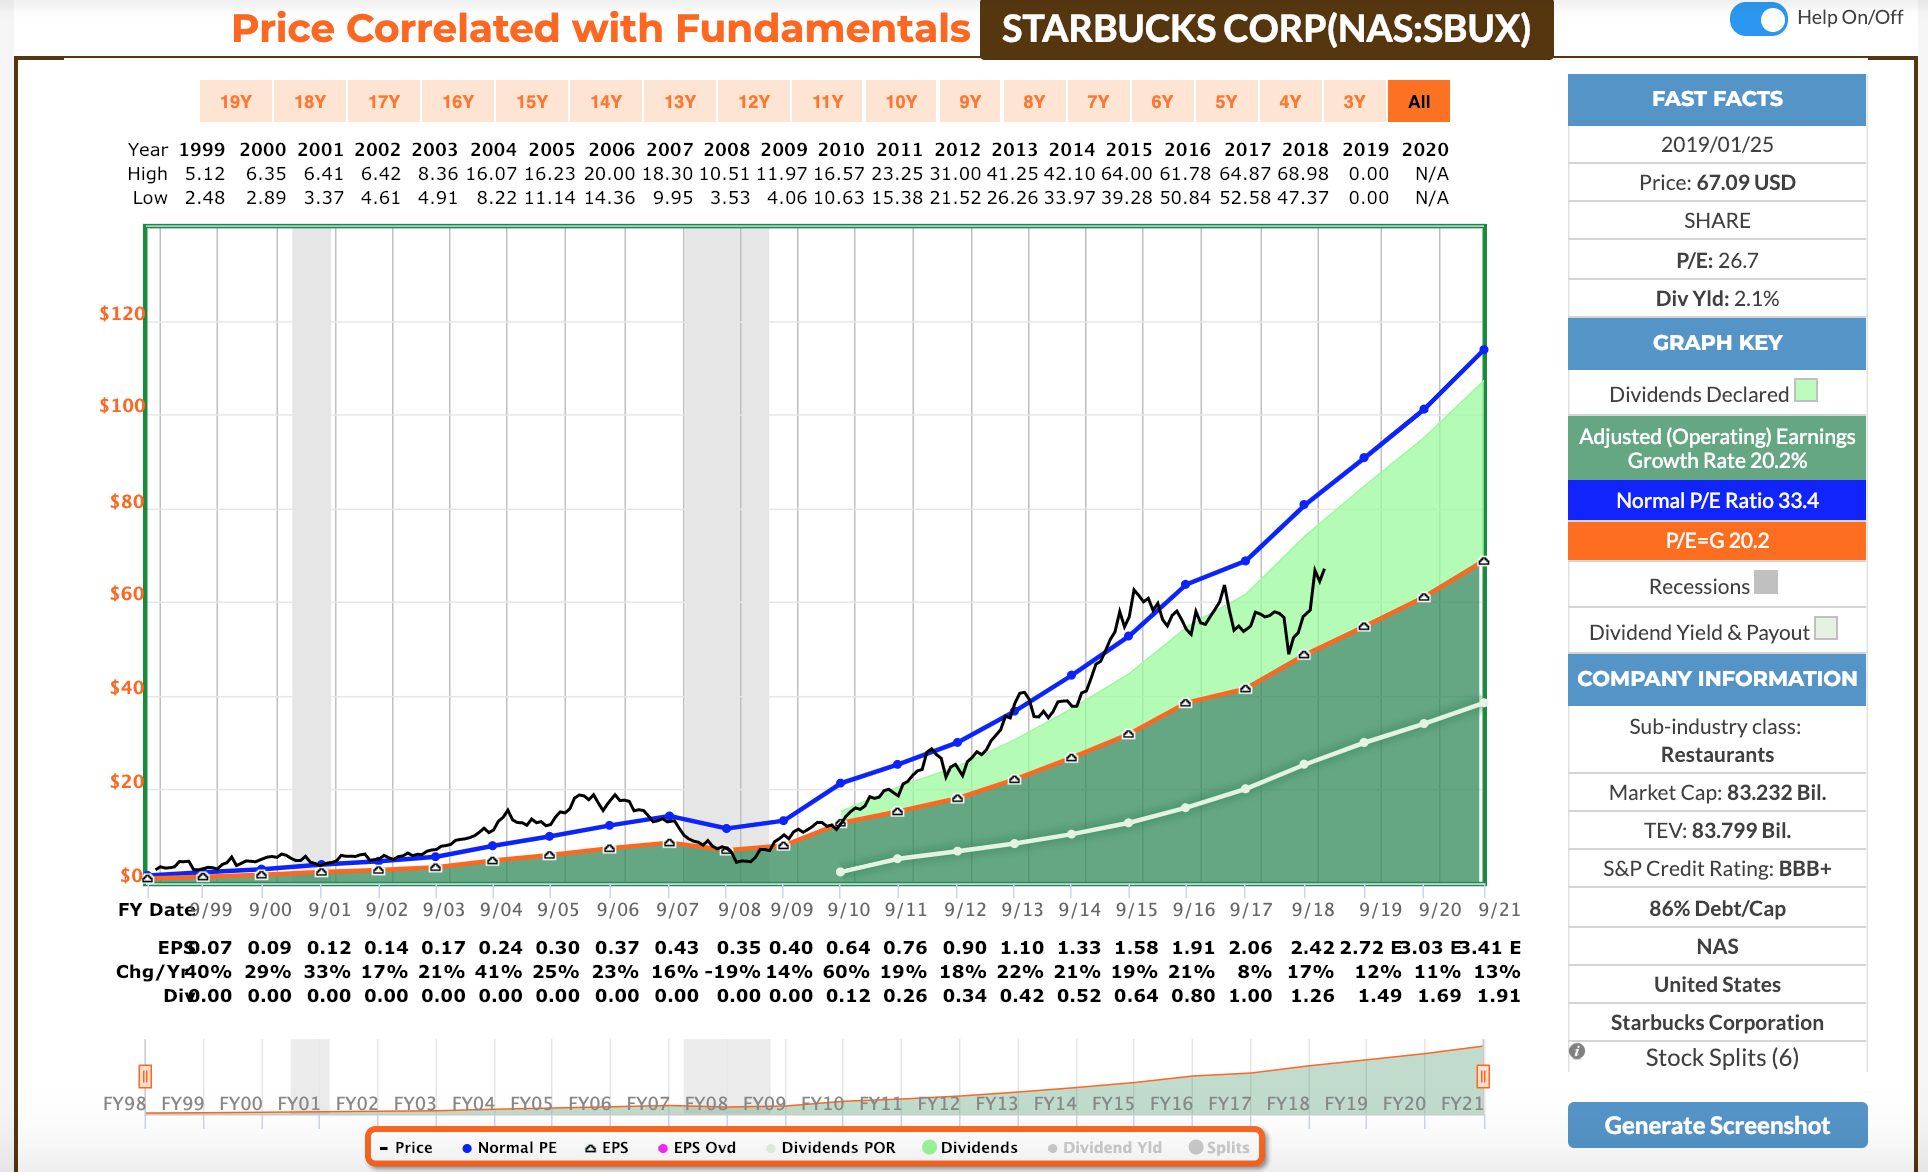 starbucks pricing strategy